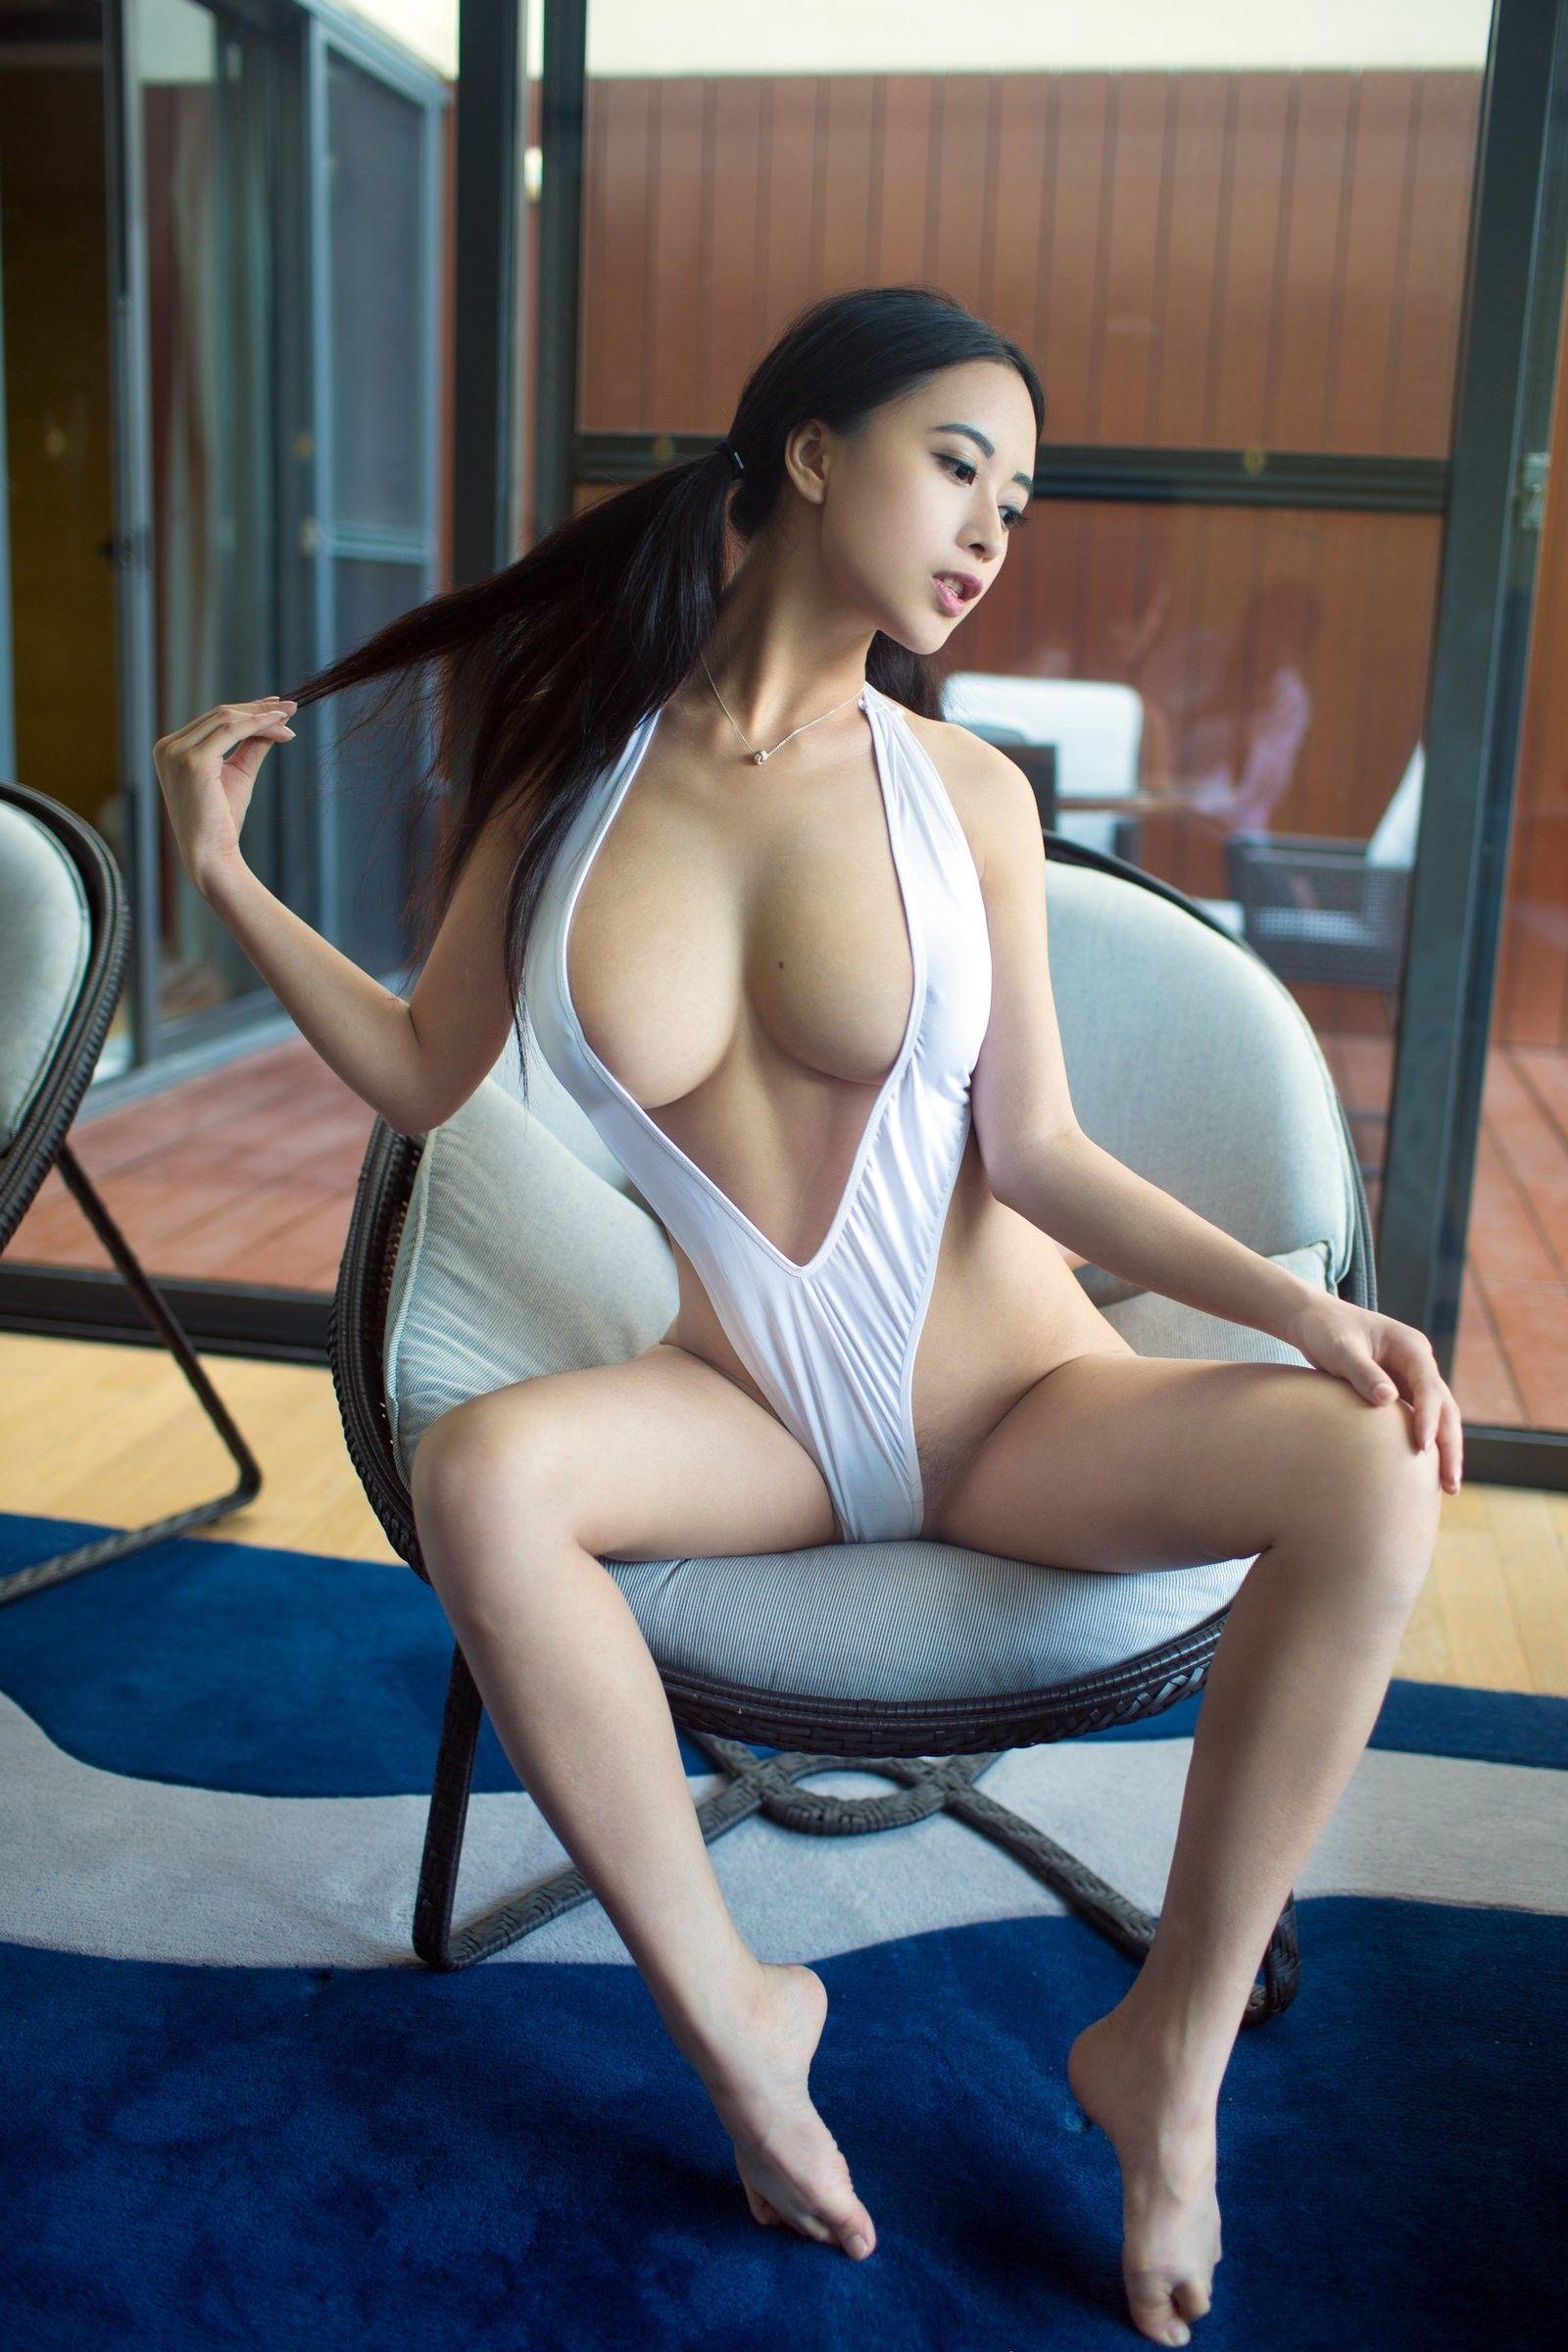 黄可- [tuigirl推女郎] 月刊影像 第66期 | asian beauties | pinterest